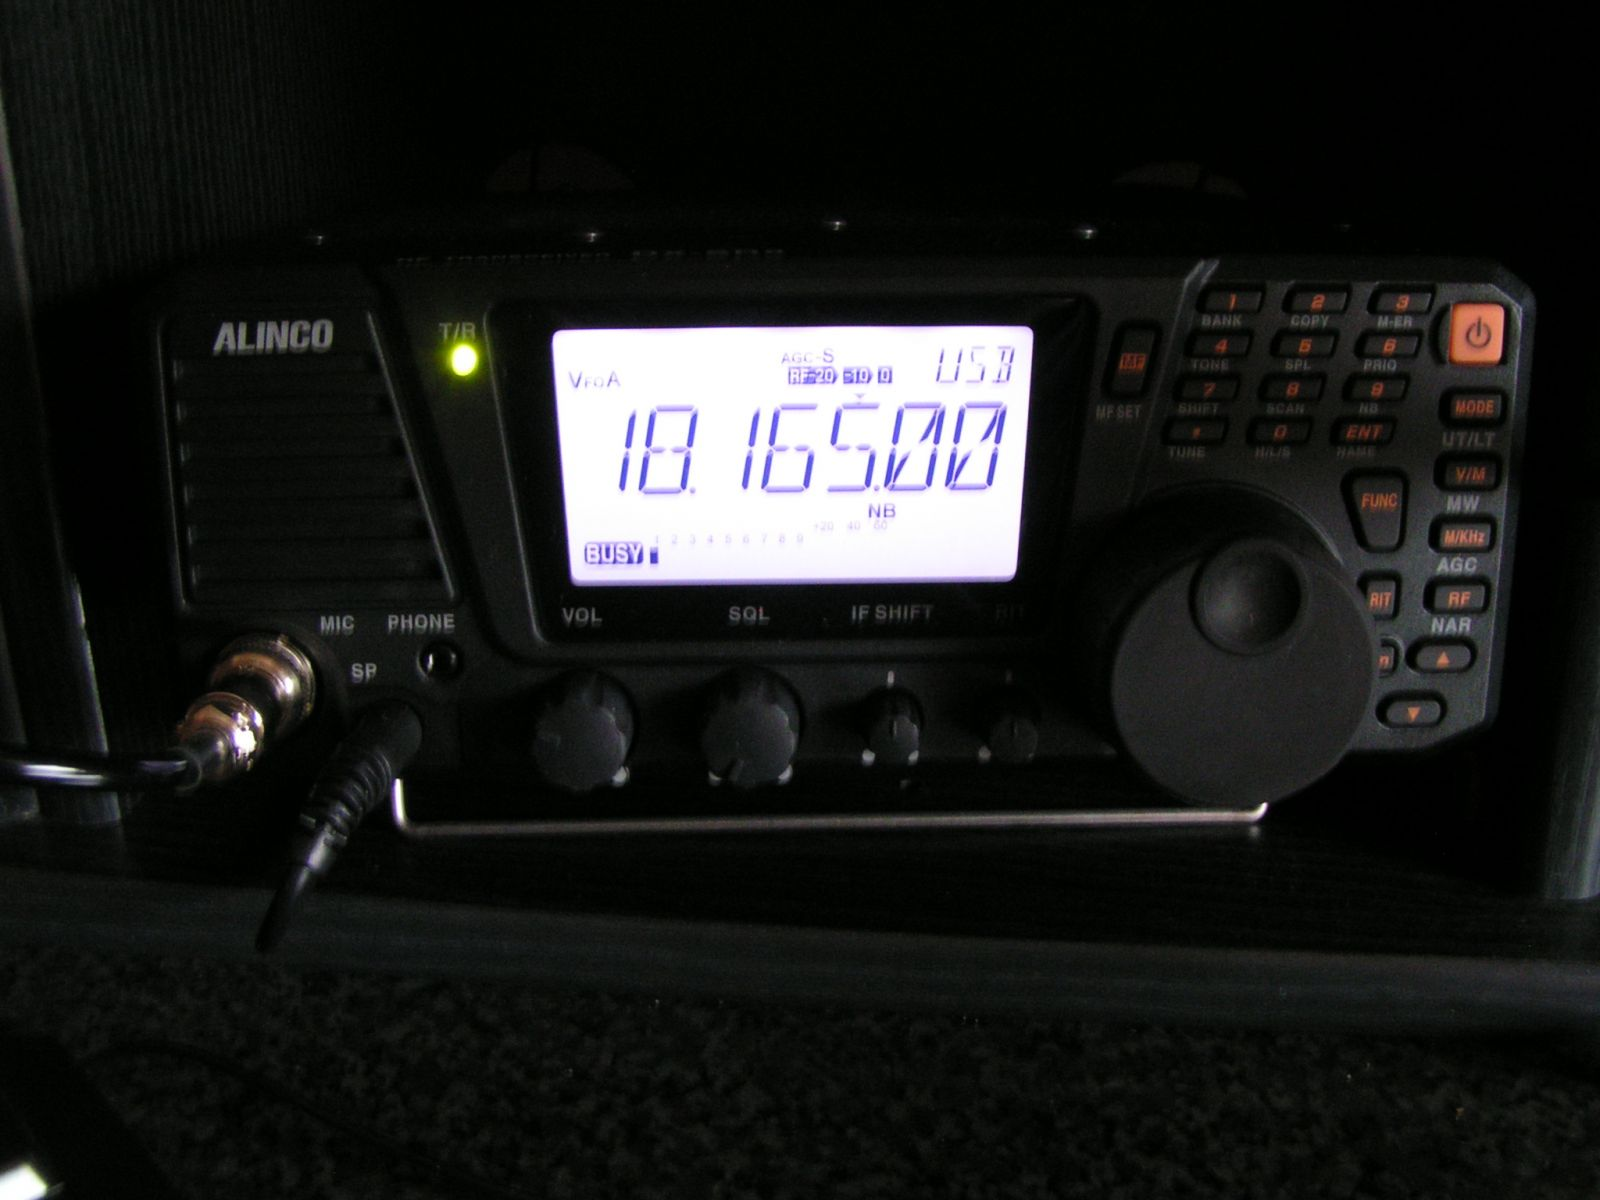 ALINCO DX-SR 8